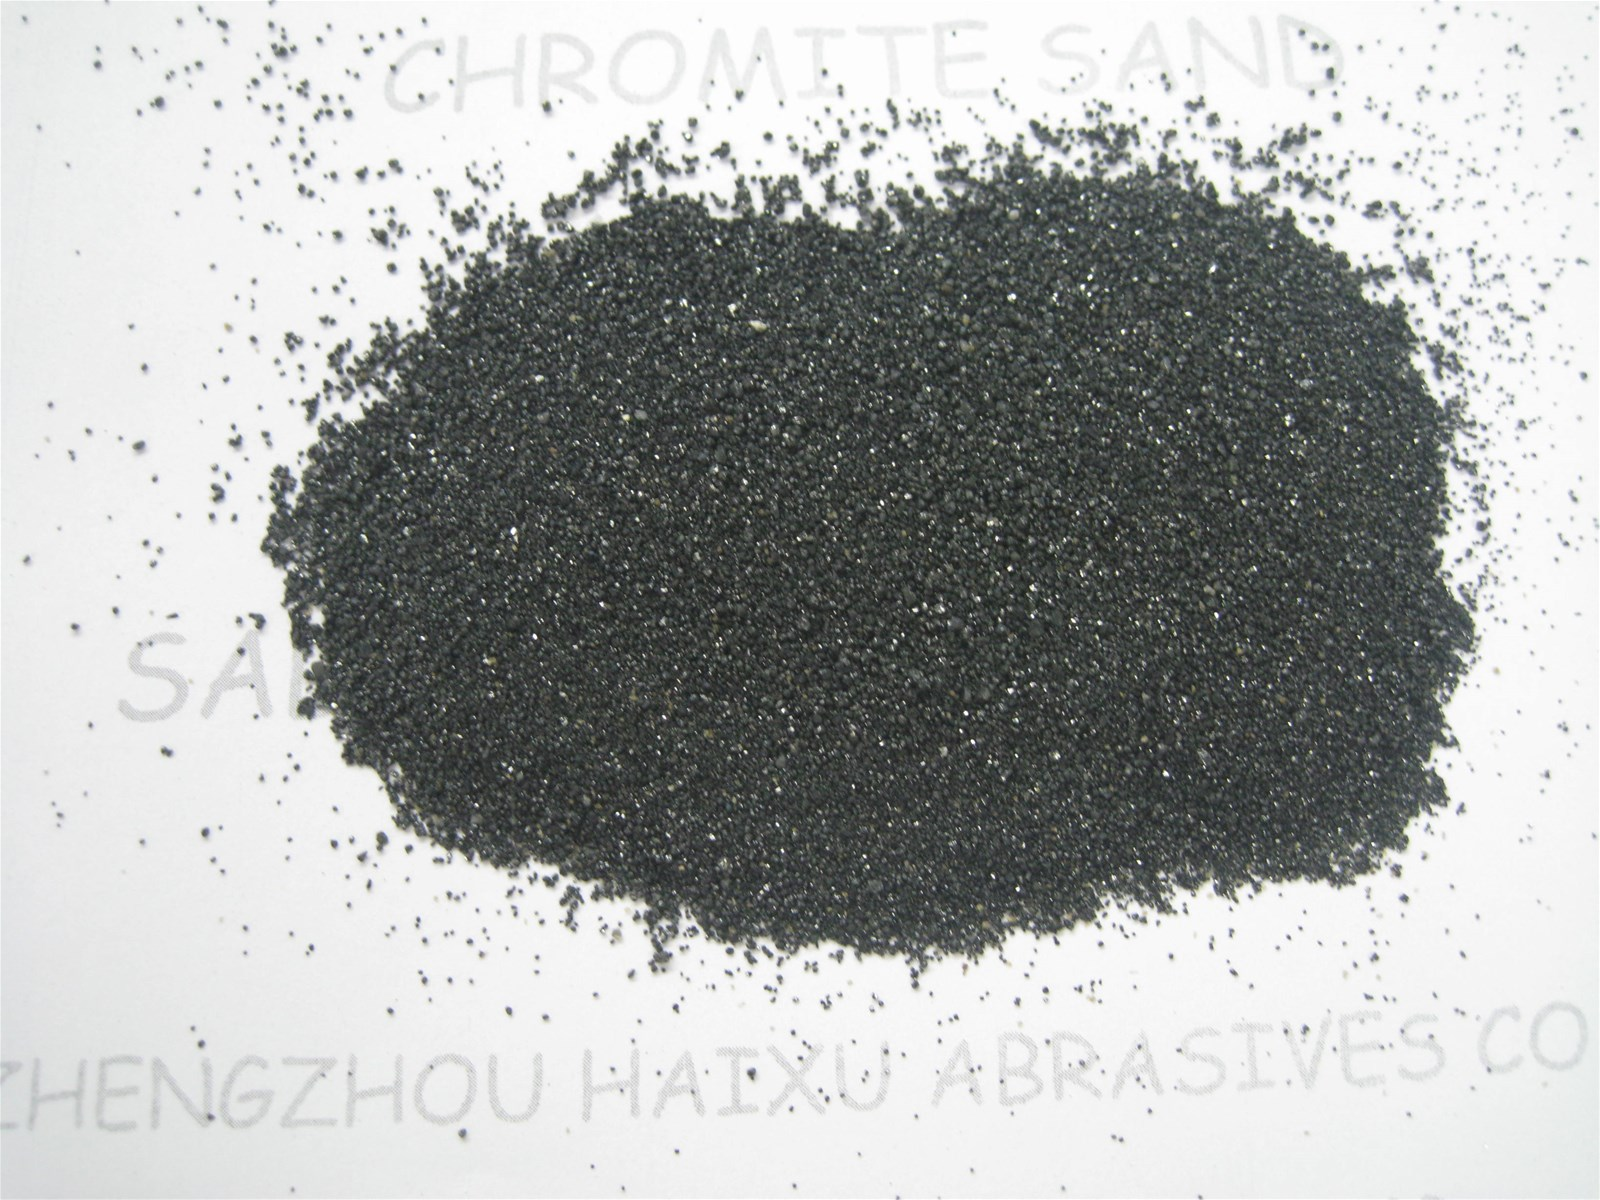 South africa Cr2O3 46 Chromite sand